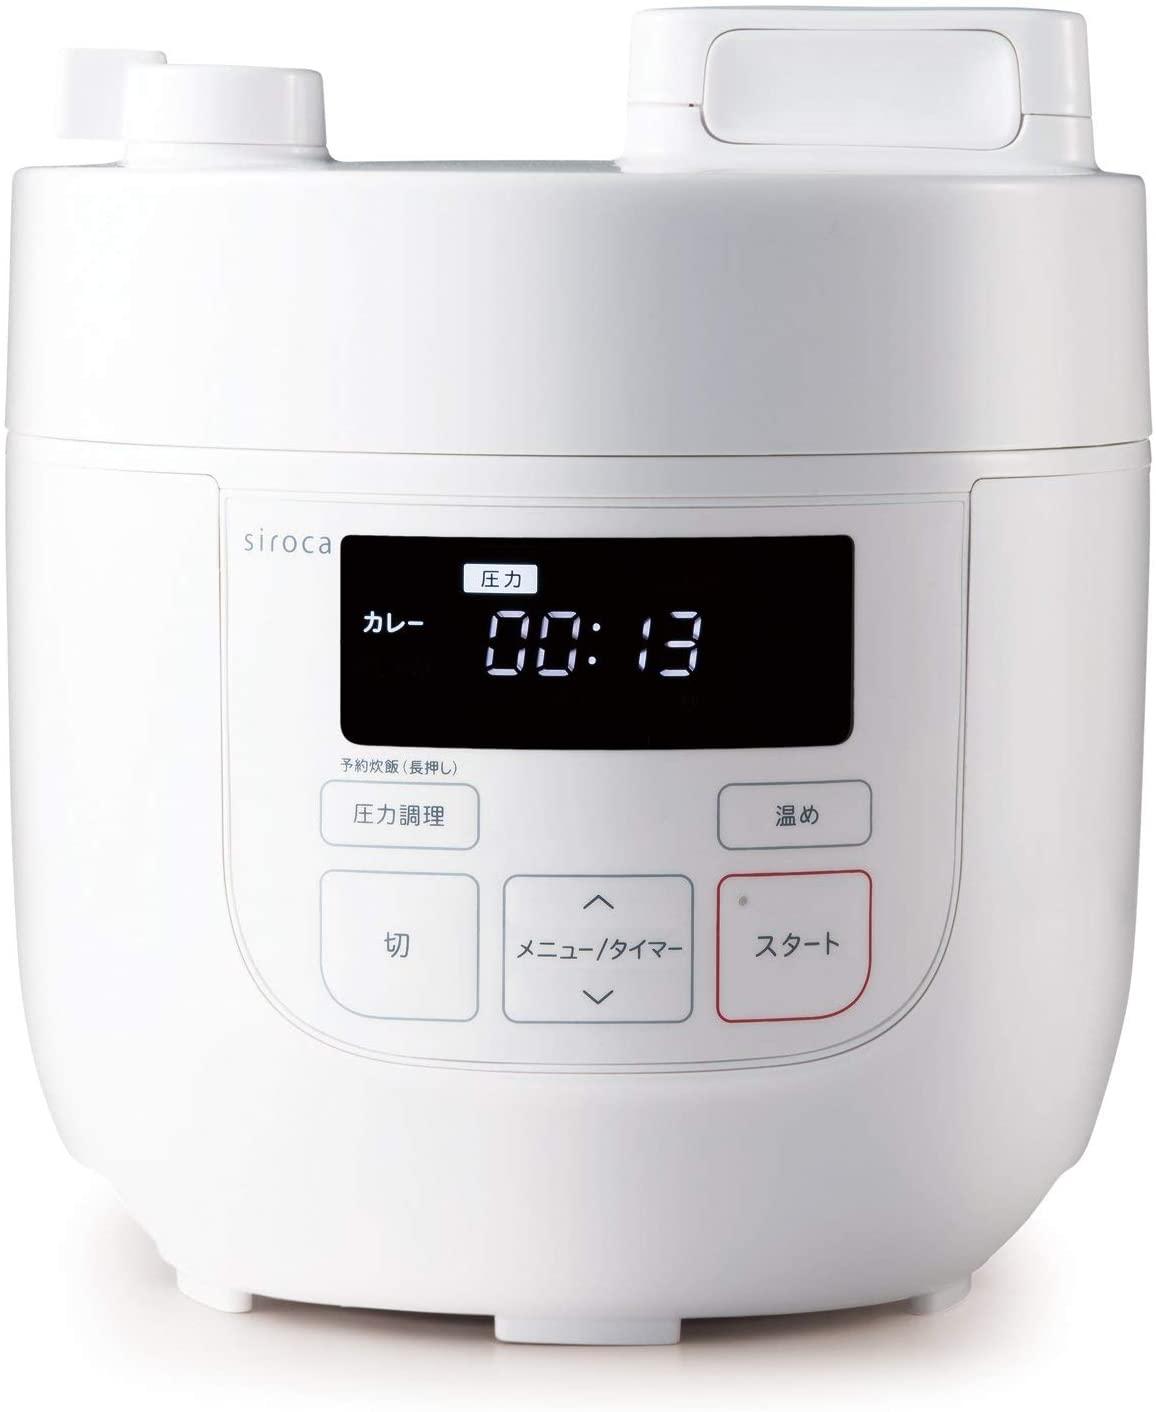 siroca(シロカ)電気圧力鍋 SP-D121の商品画像